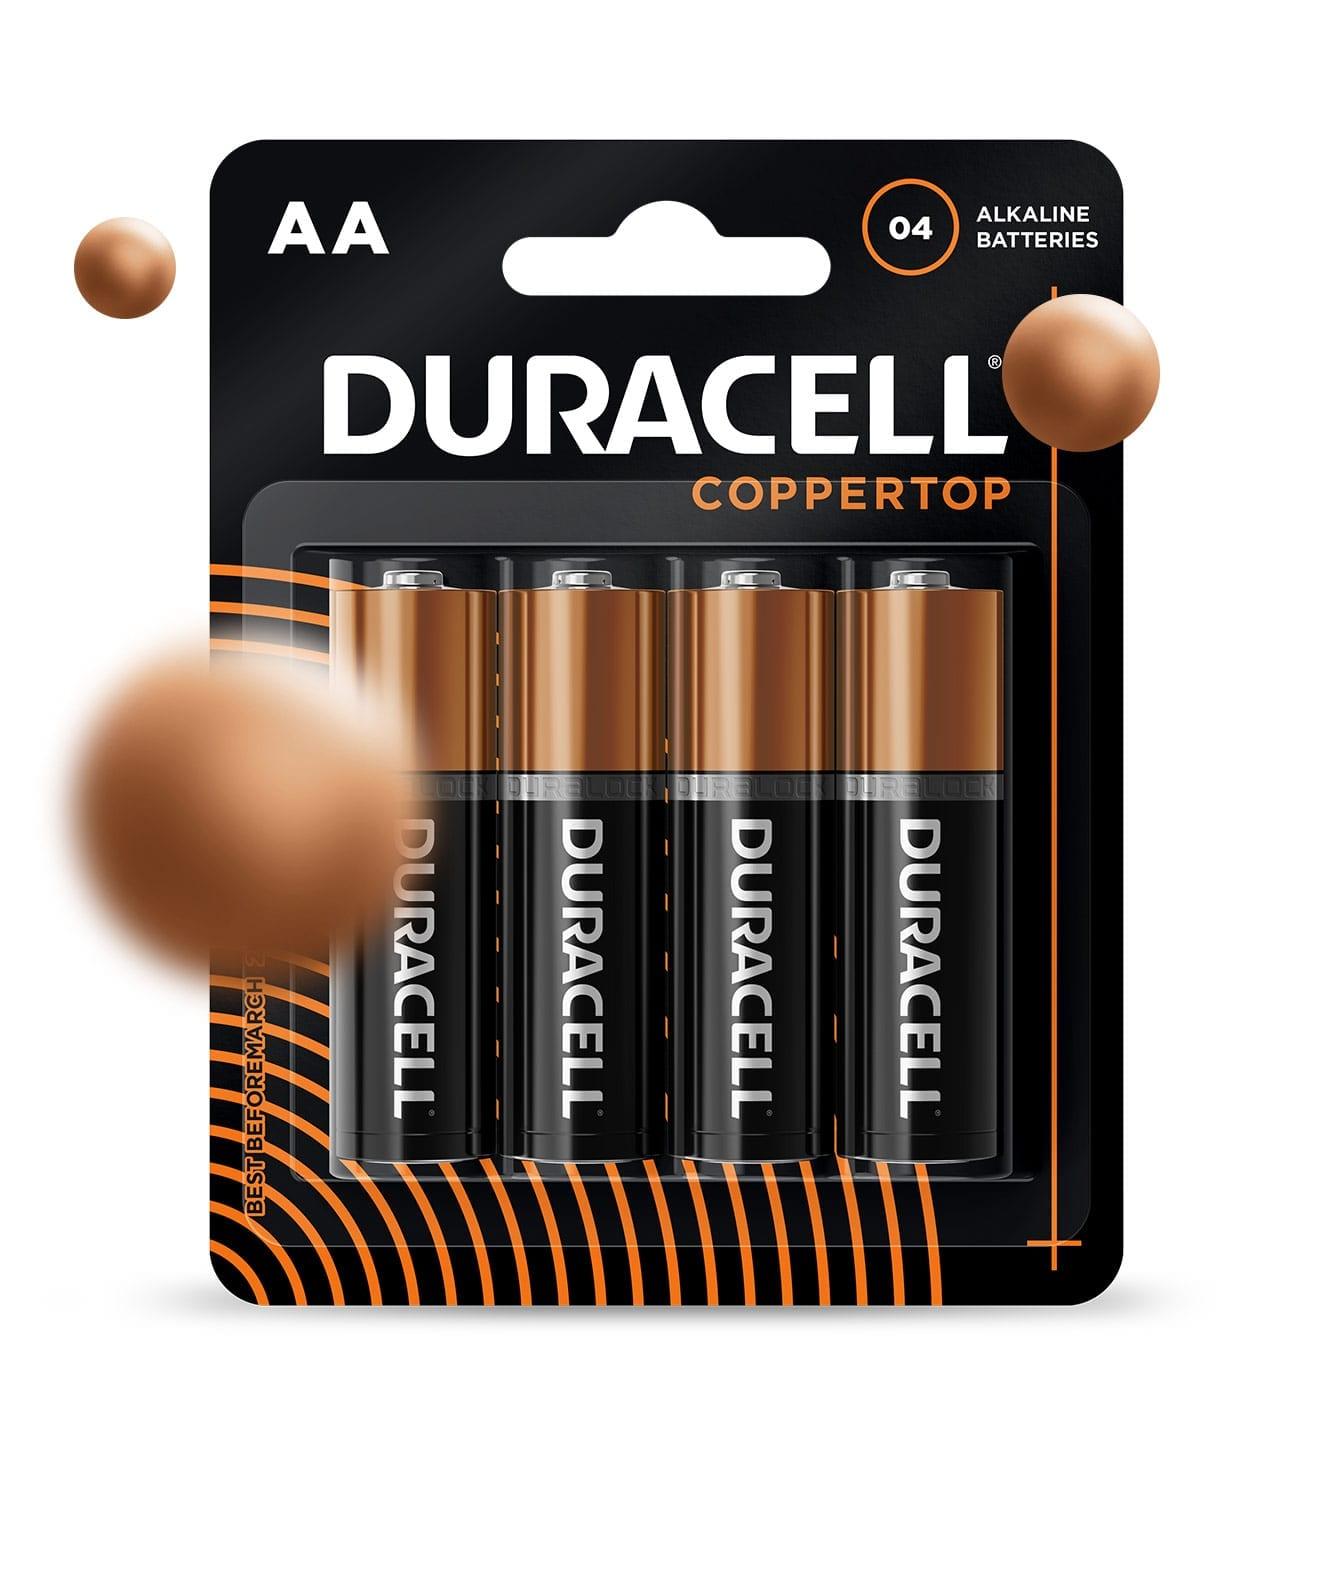 Duracell coppertop packaging design